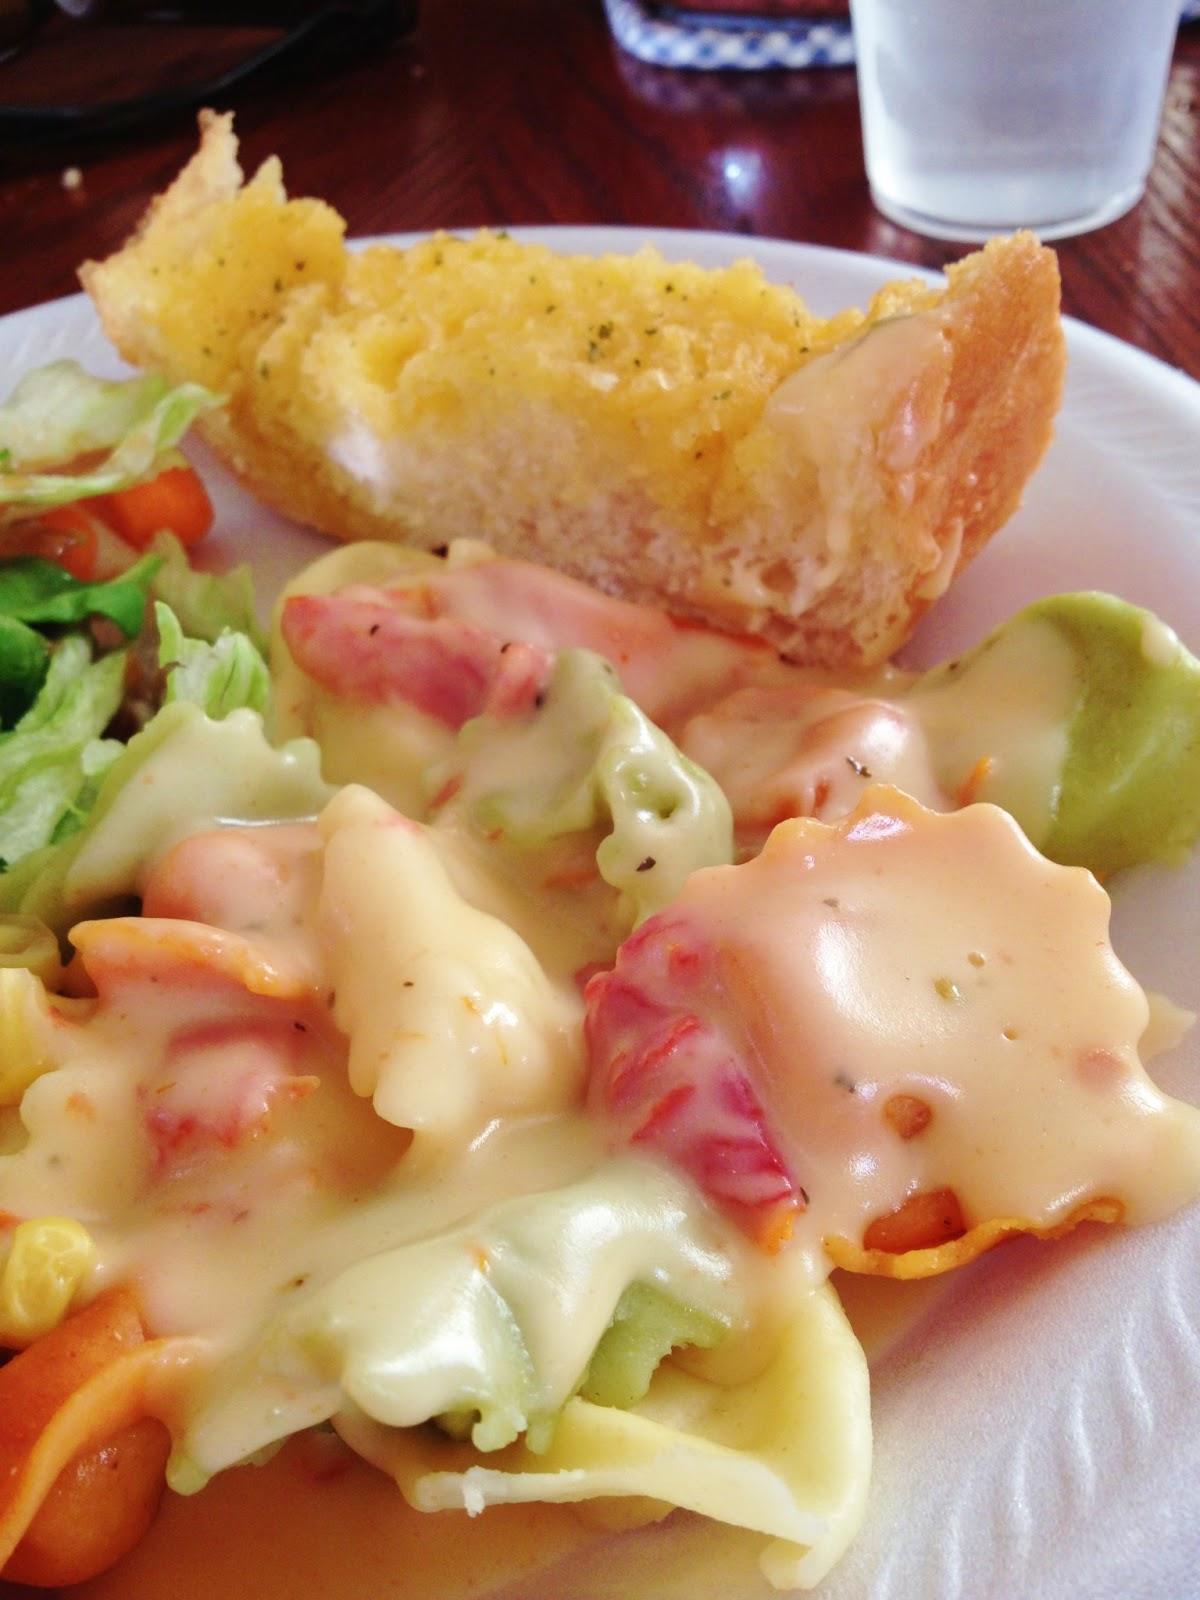 Sisters 39 Sweet Tooth Olive Garden 39 S Ravioli Di Portobello Actually Just The Amazing Sauce Recipe